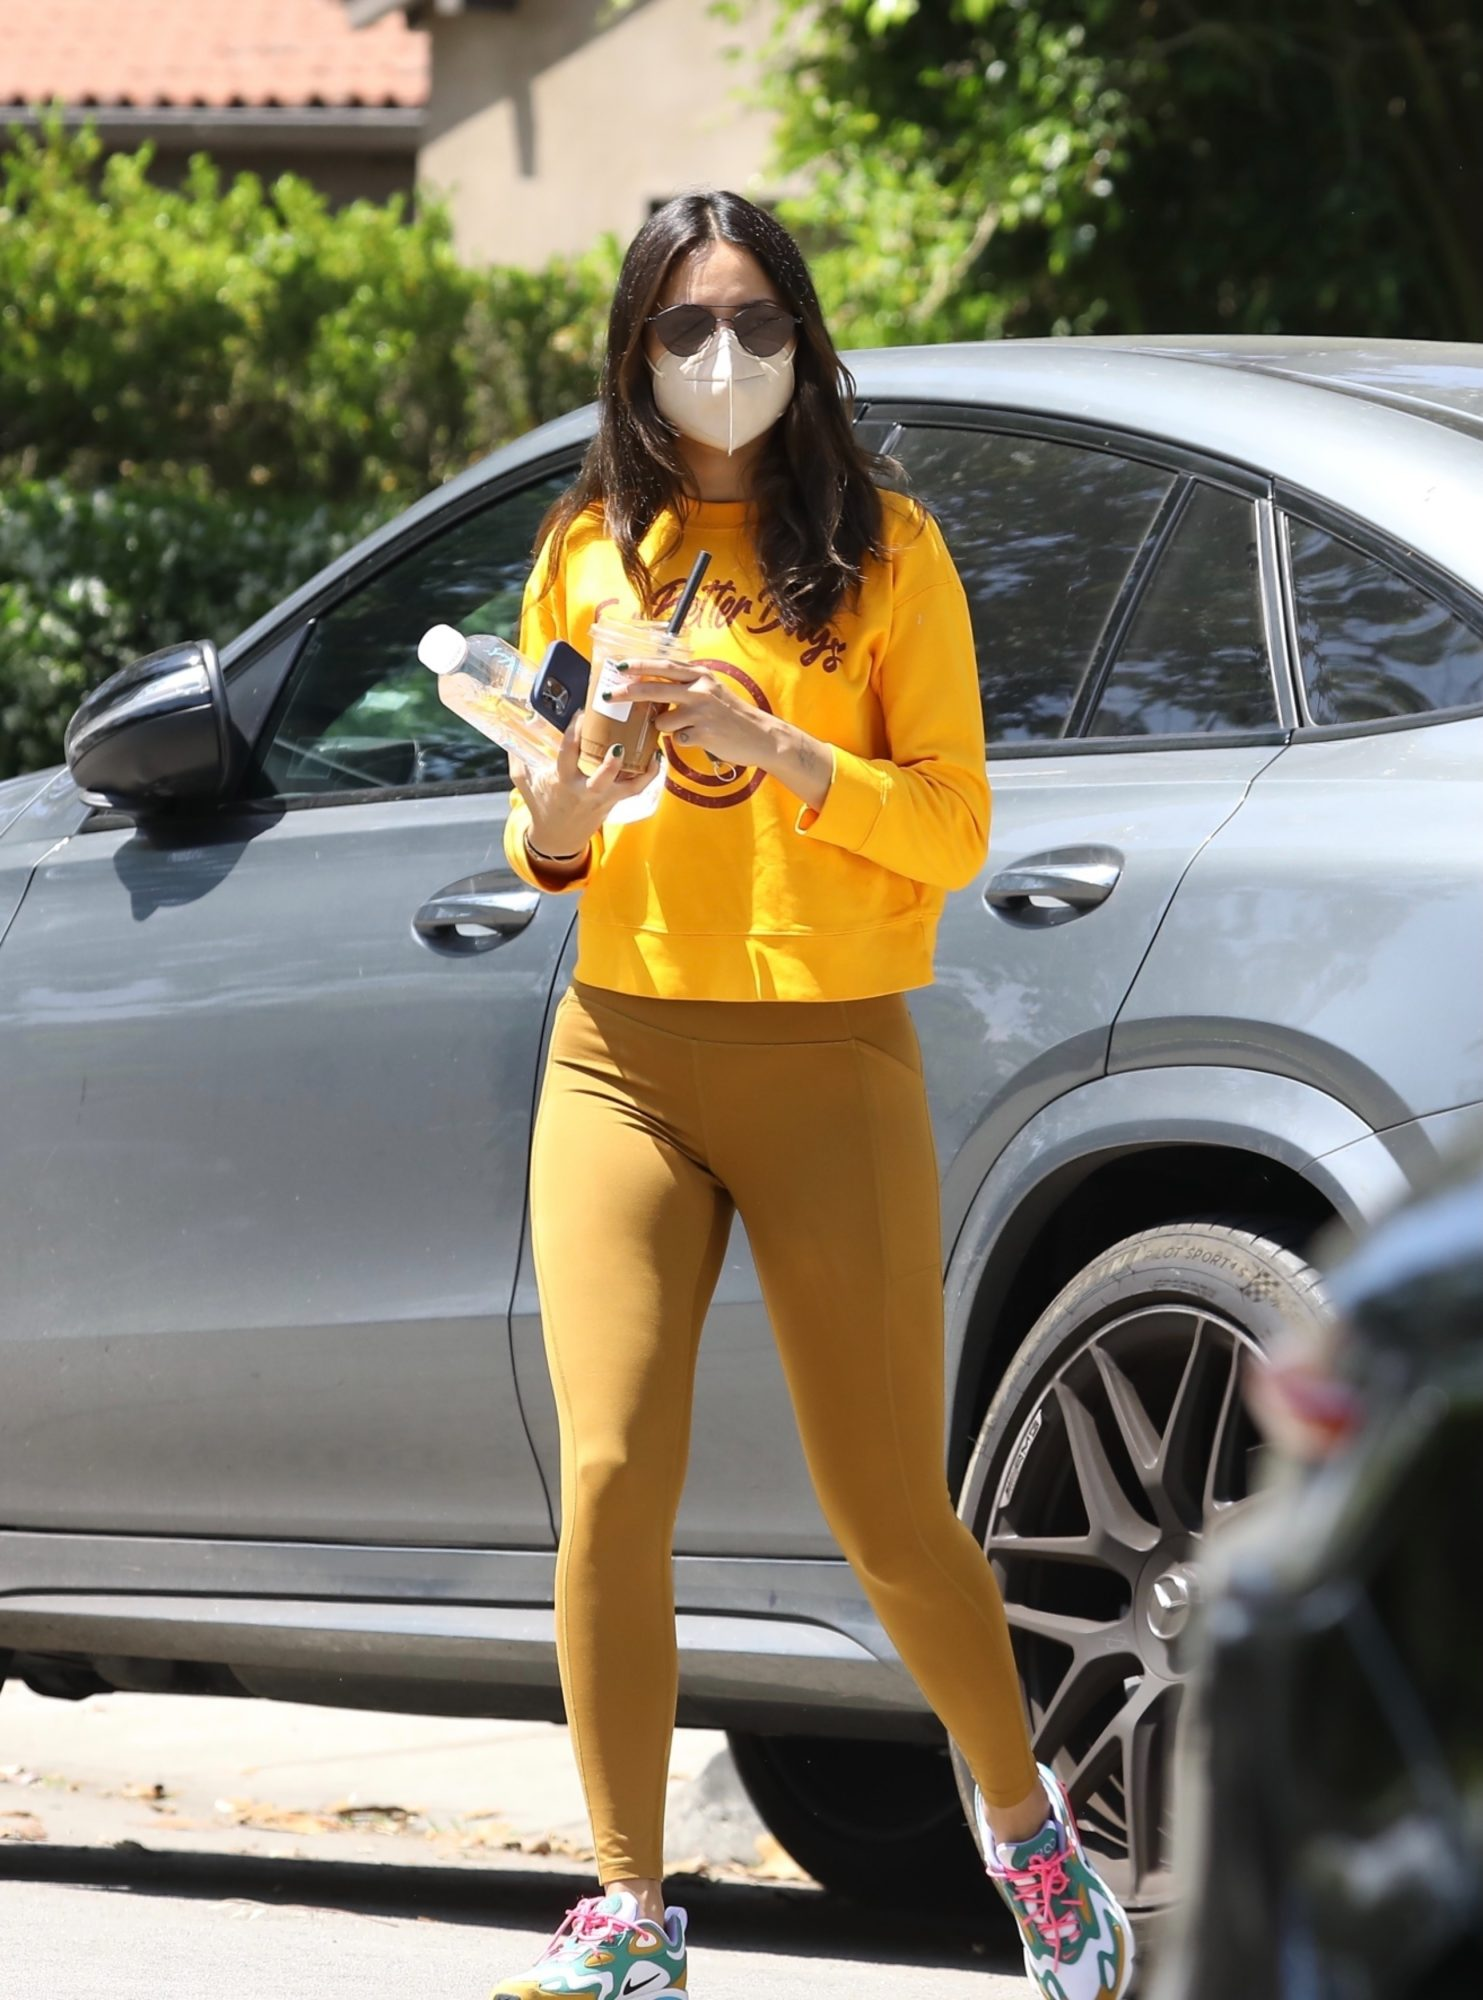 Eiza Gonzalez in Gold Leggings, Yellow Sweatshirt & Newly Dyed Darker Hair